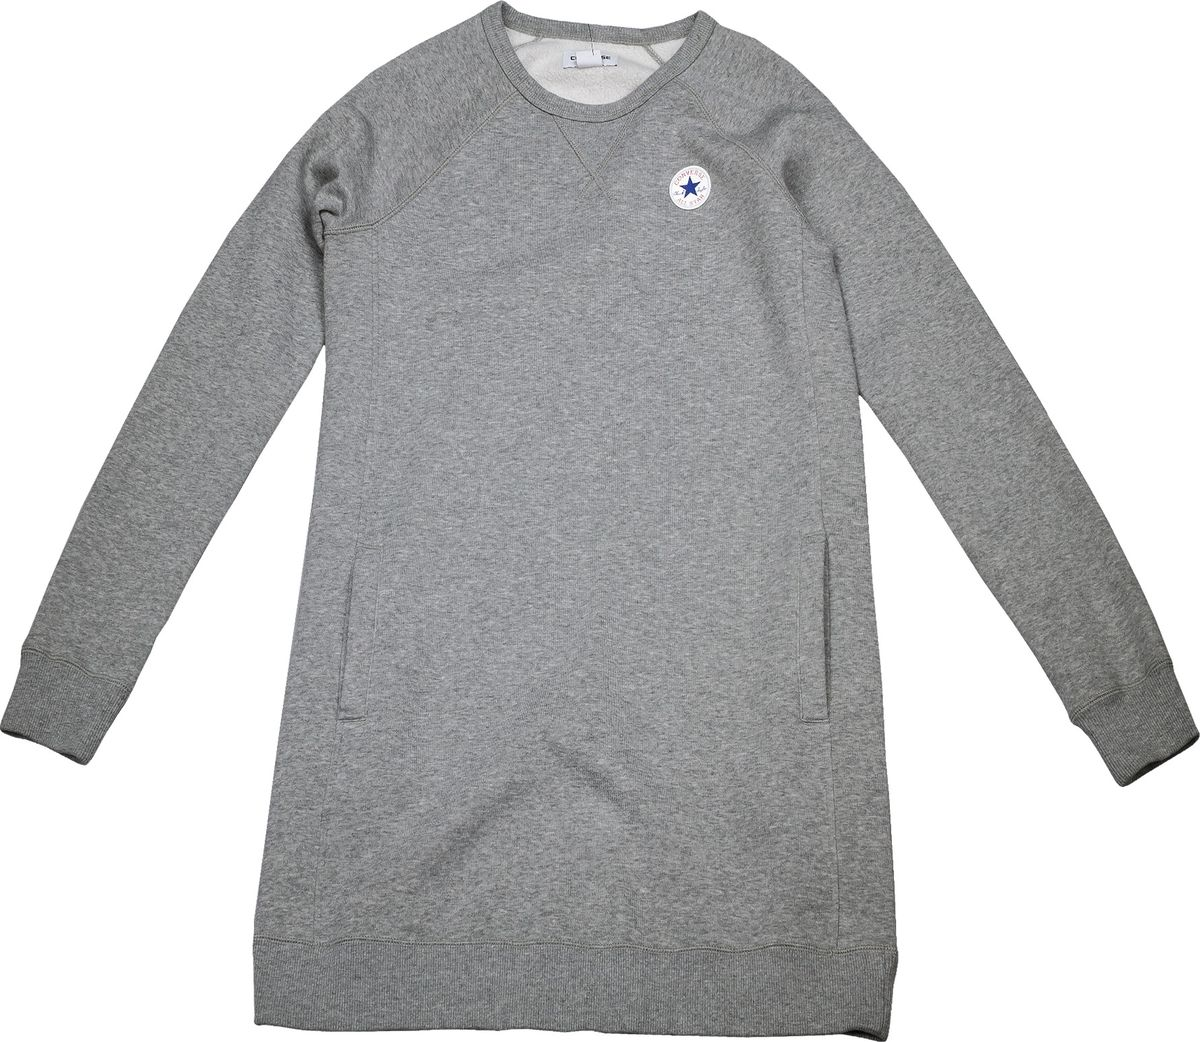 Платье женское Converse Core Sweatshirt Dress, цвет: серый. 10004545035. Размер XS (42)10004545035